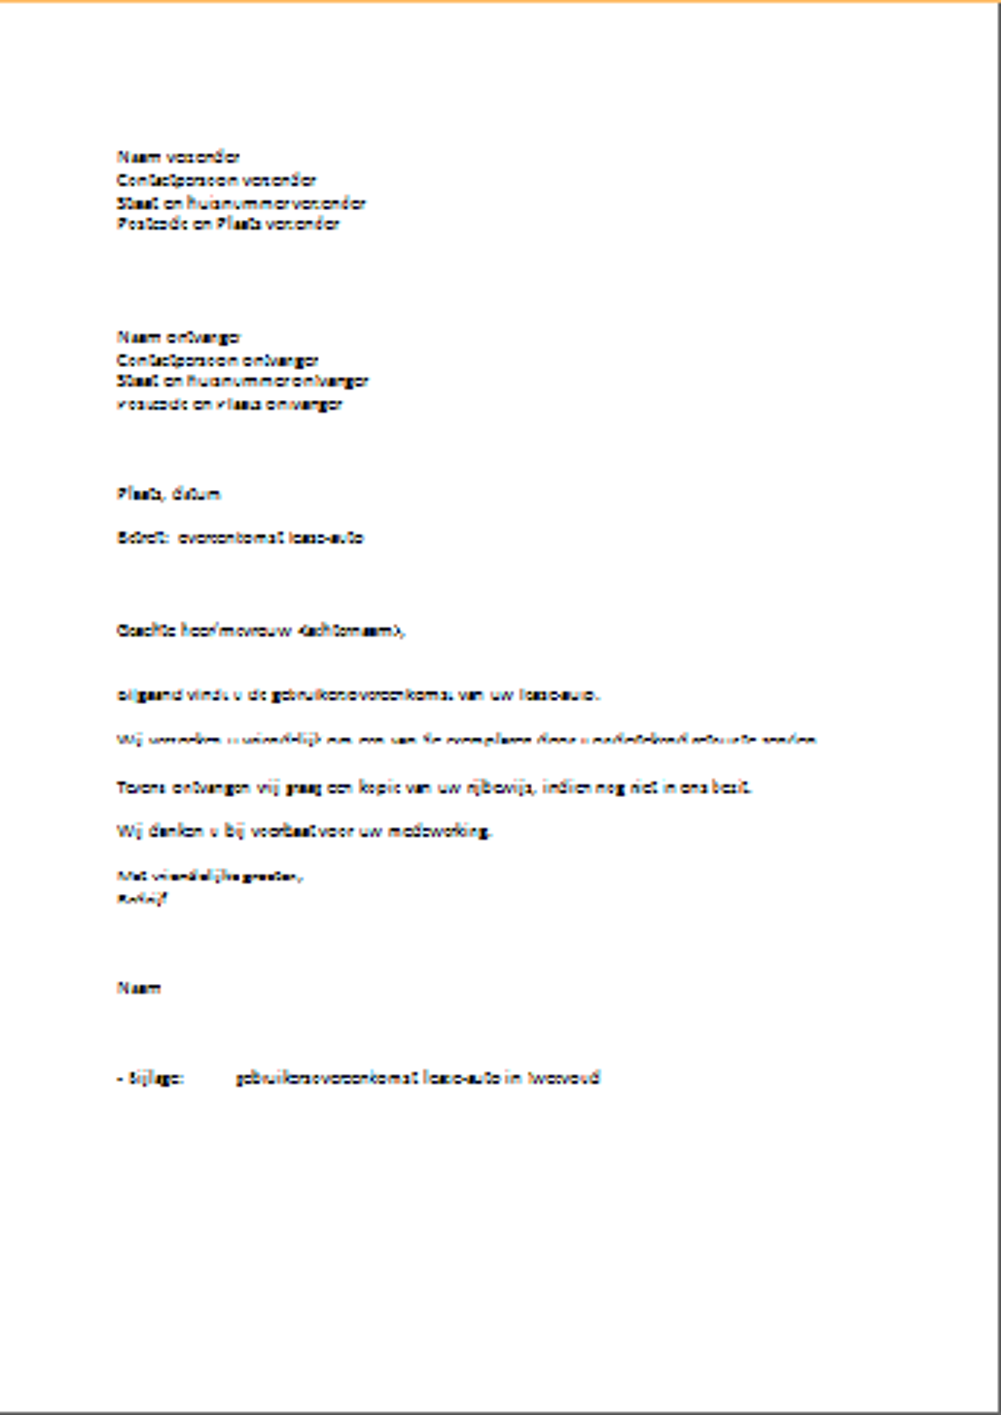 opdracht klachtenbrief schrijven Opdracht Klachtenbrief Schrijven | gantinova